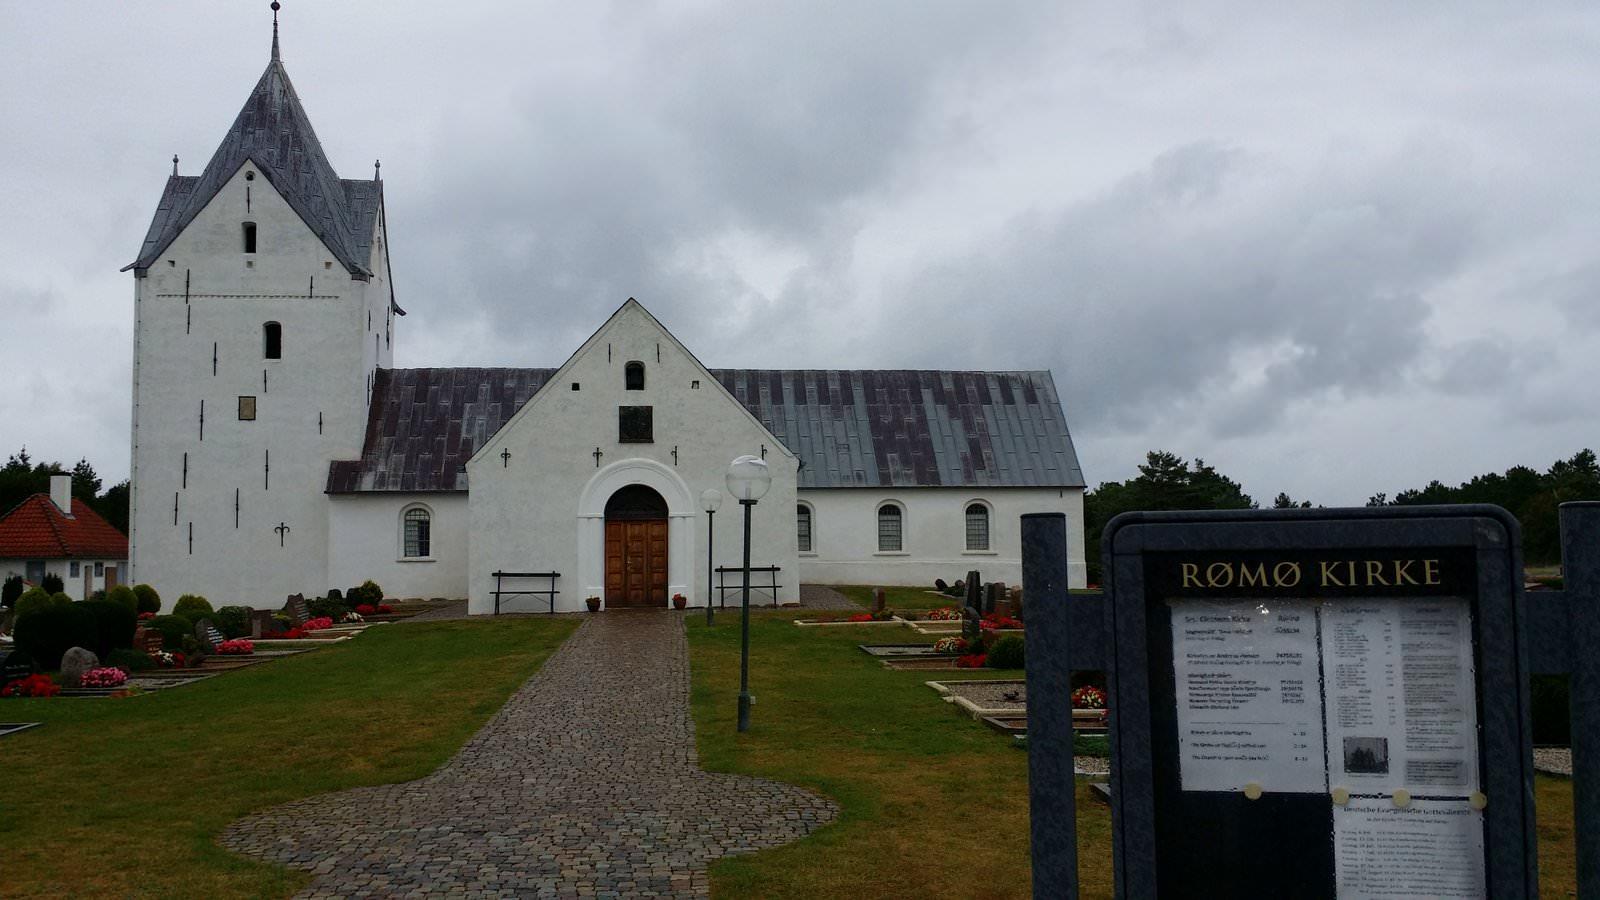 Romo Kirche